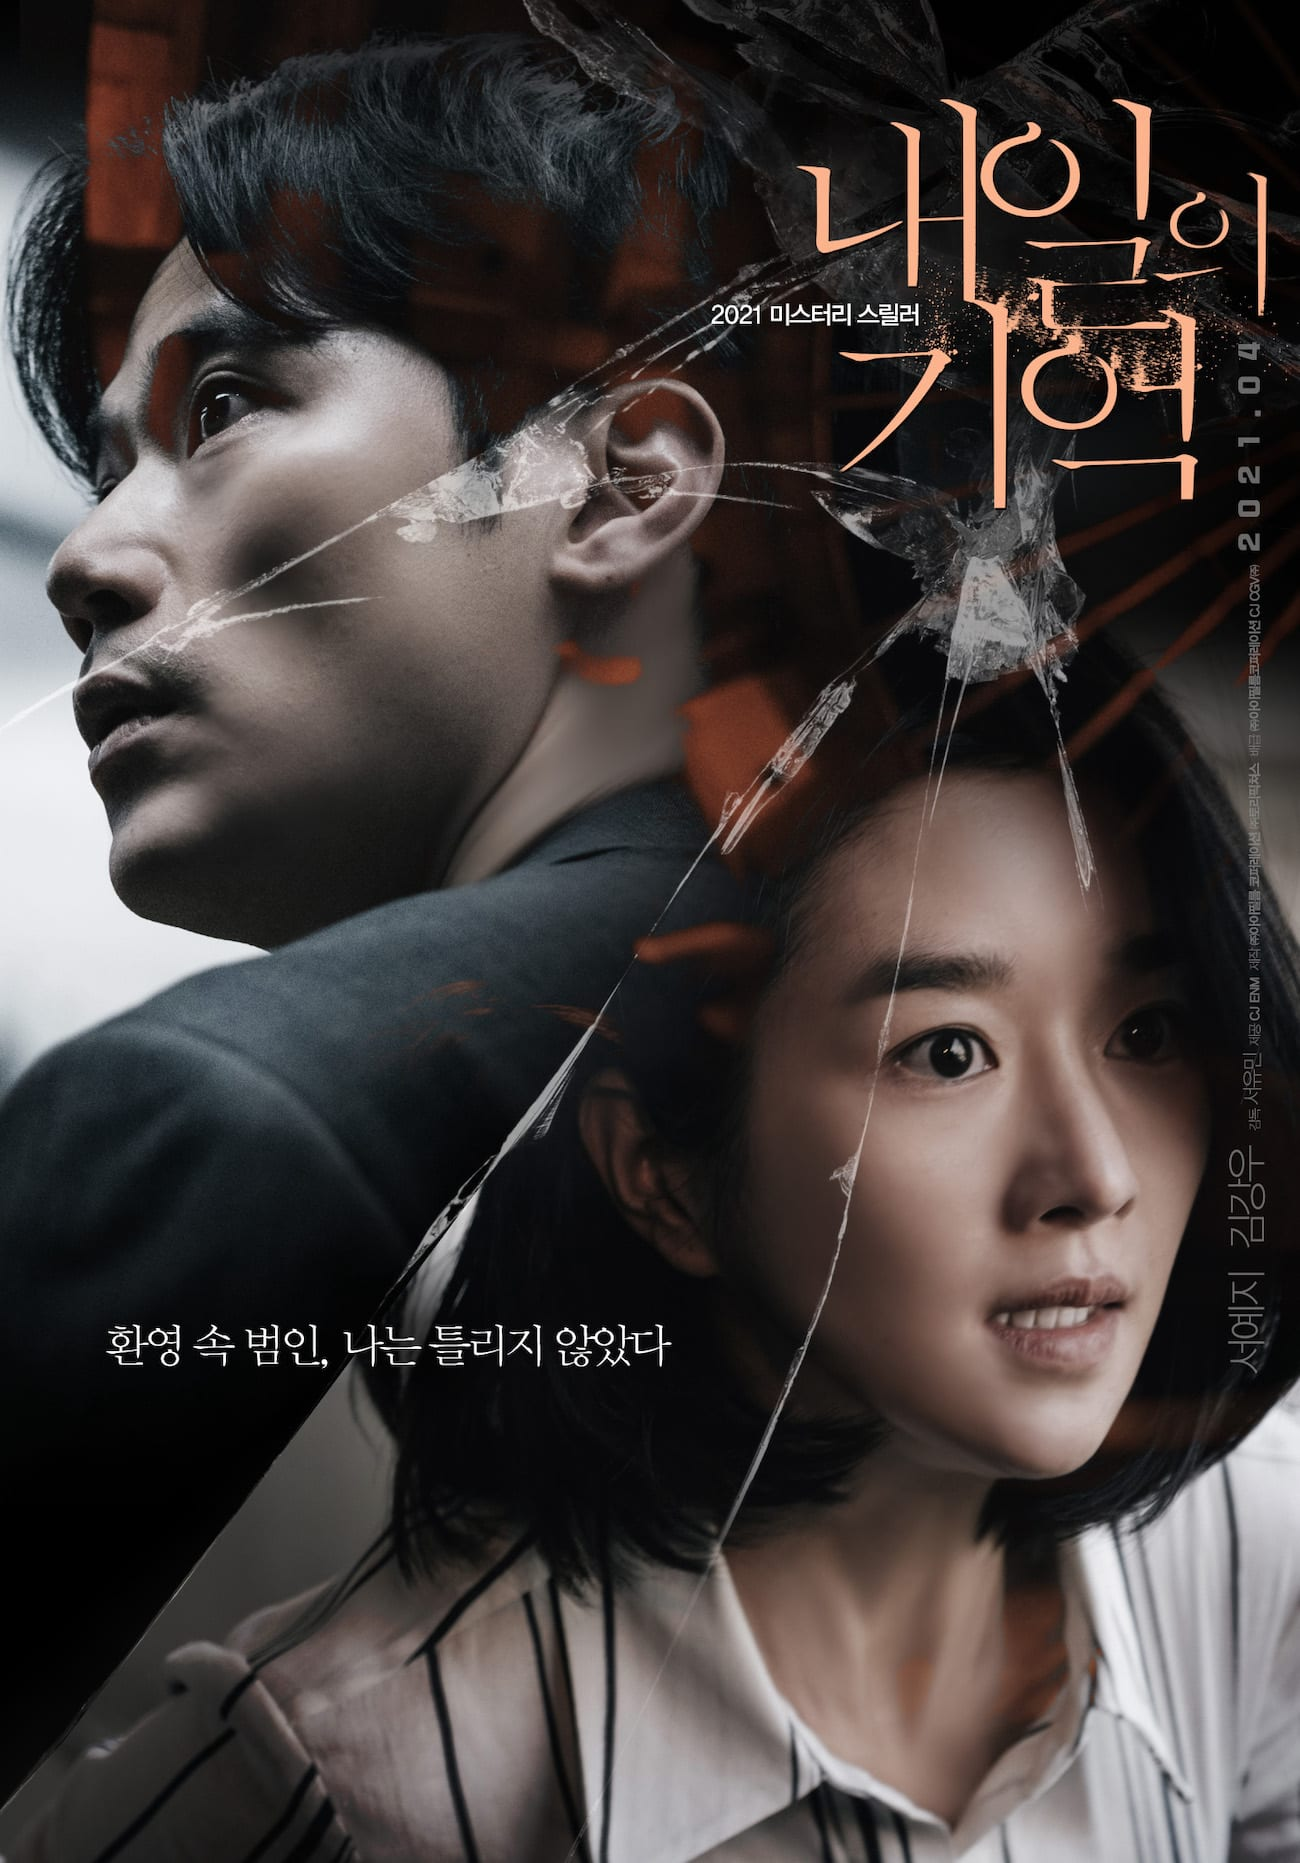 Recalled MOvie KIm Kwang Seo J Yi